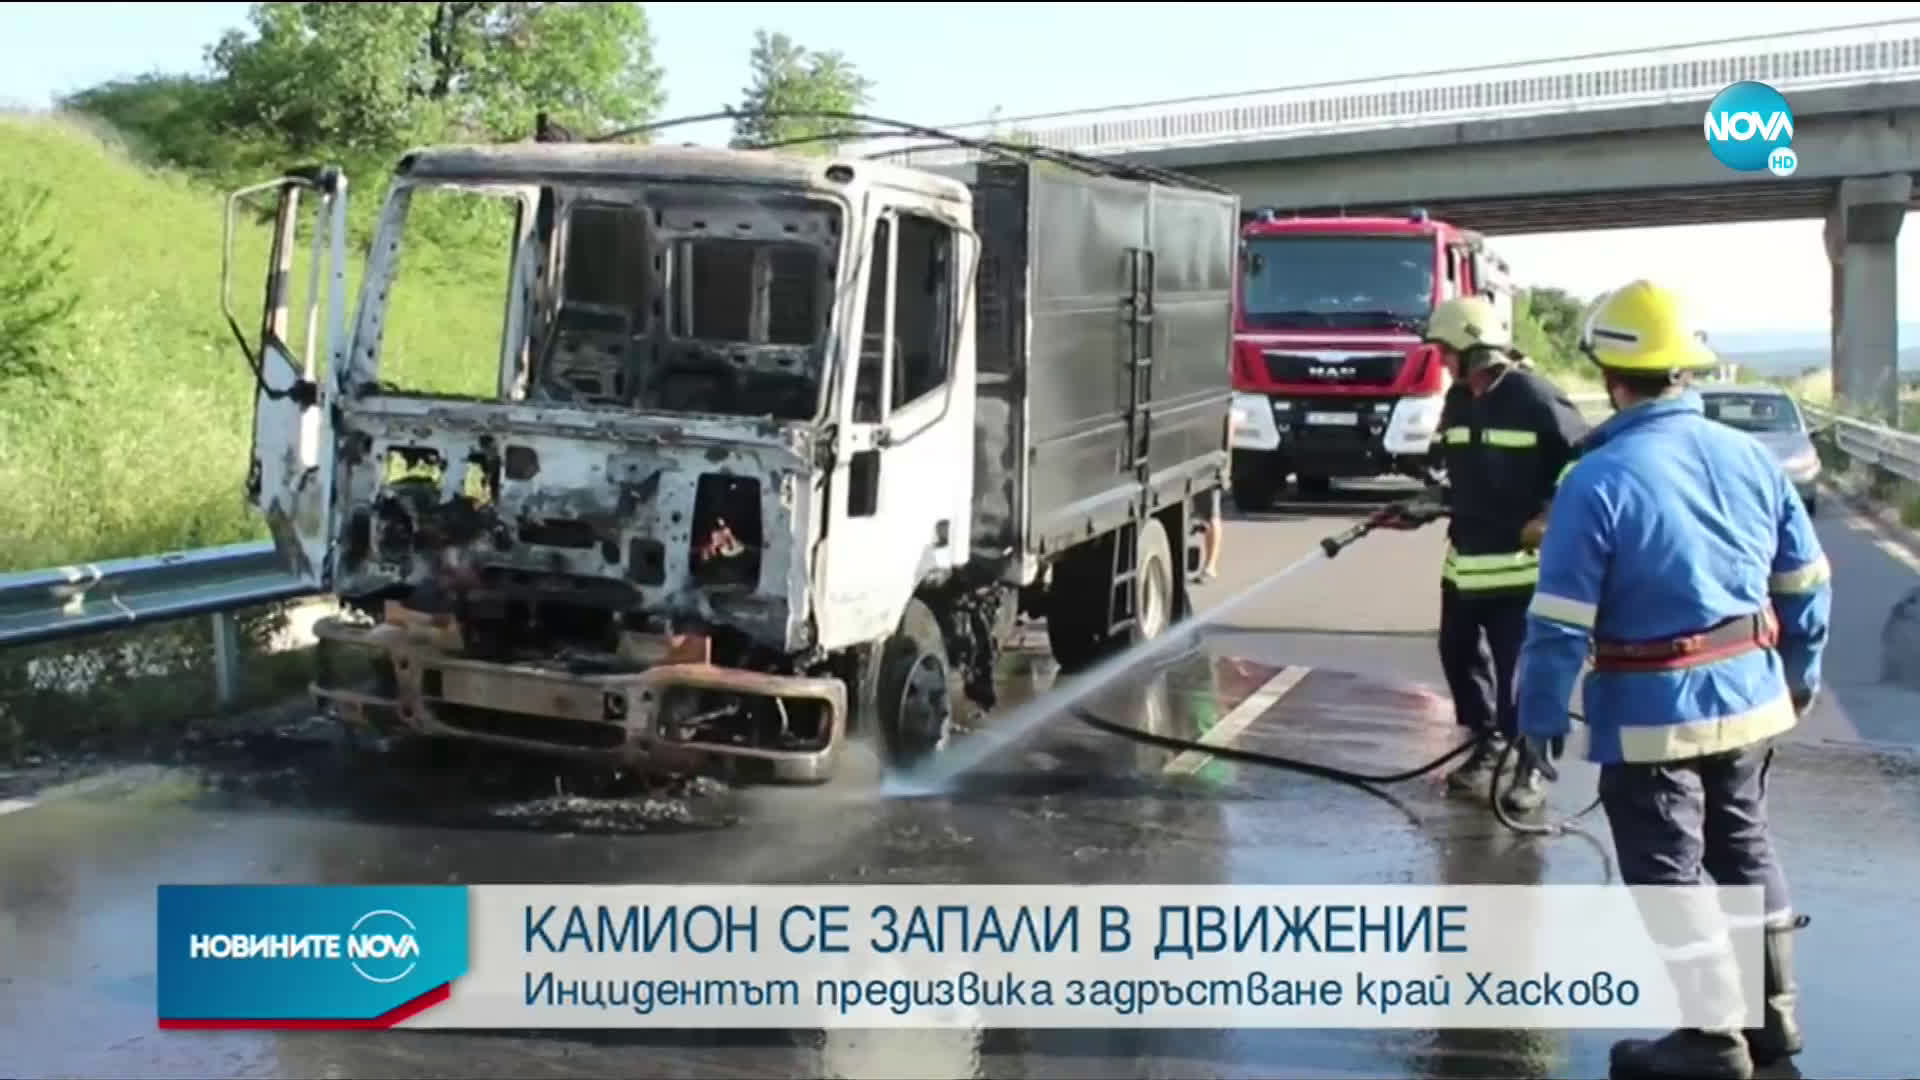 Камион се запали в движение край Хасково